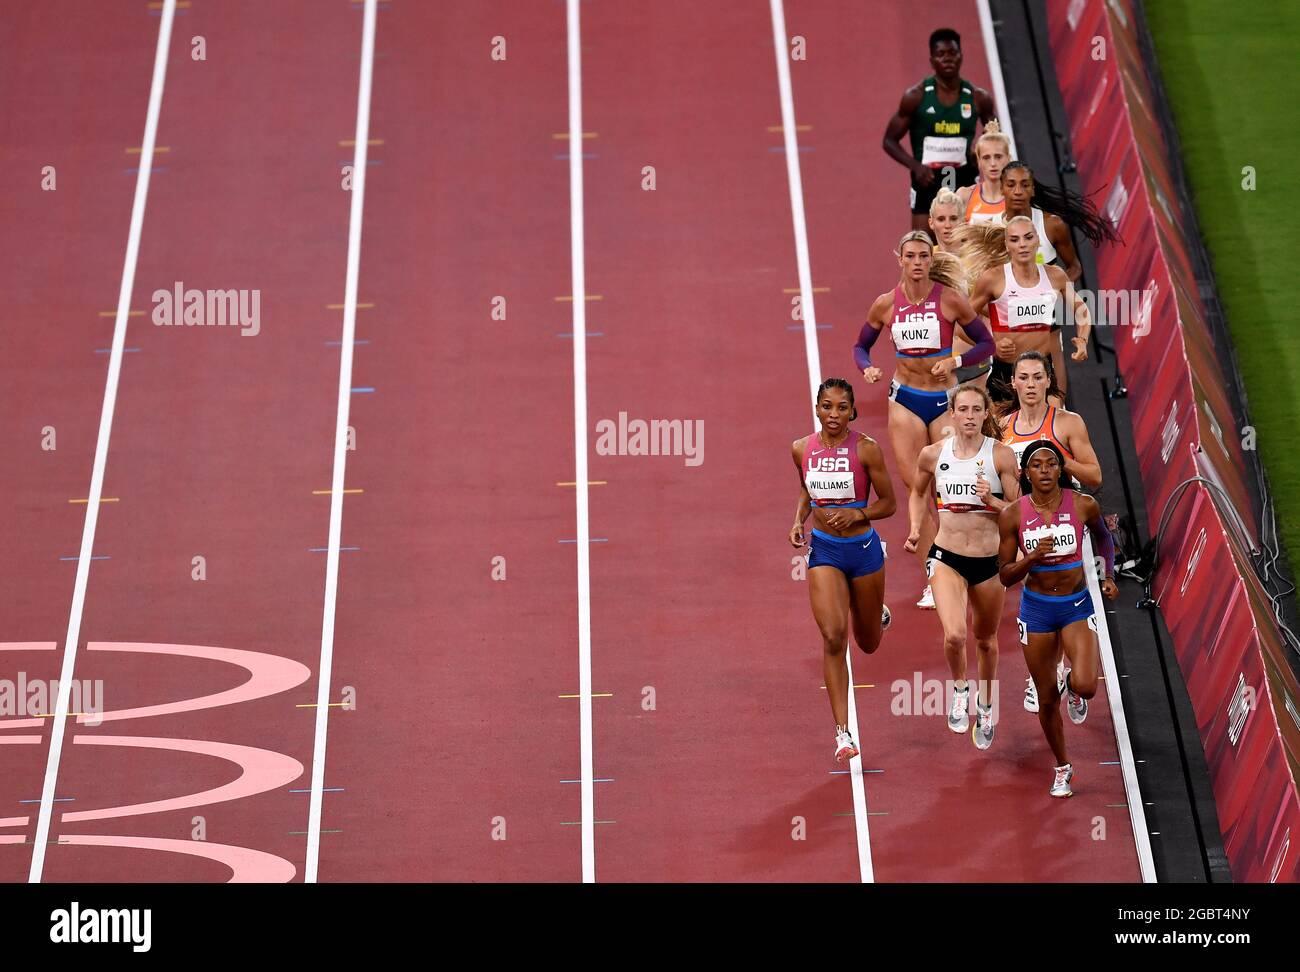 Tokyo 2020 Olimpiadi - Atletica - Donna 800m - Heptathlon 800m - Stadio Olimpico, Tokyo, Giappone - 5 agosto 2021. Gli atleti compete REUTERS/Clodagh Kilcoyne Foto Stock